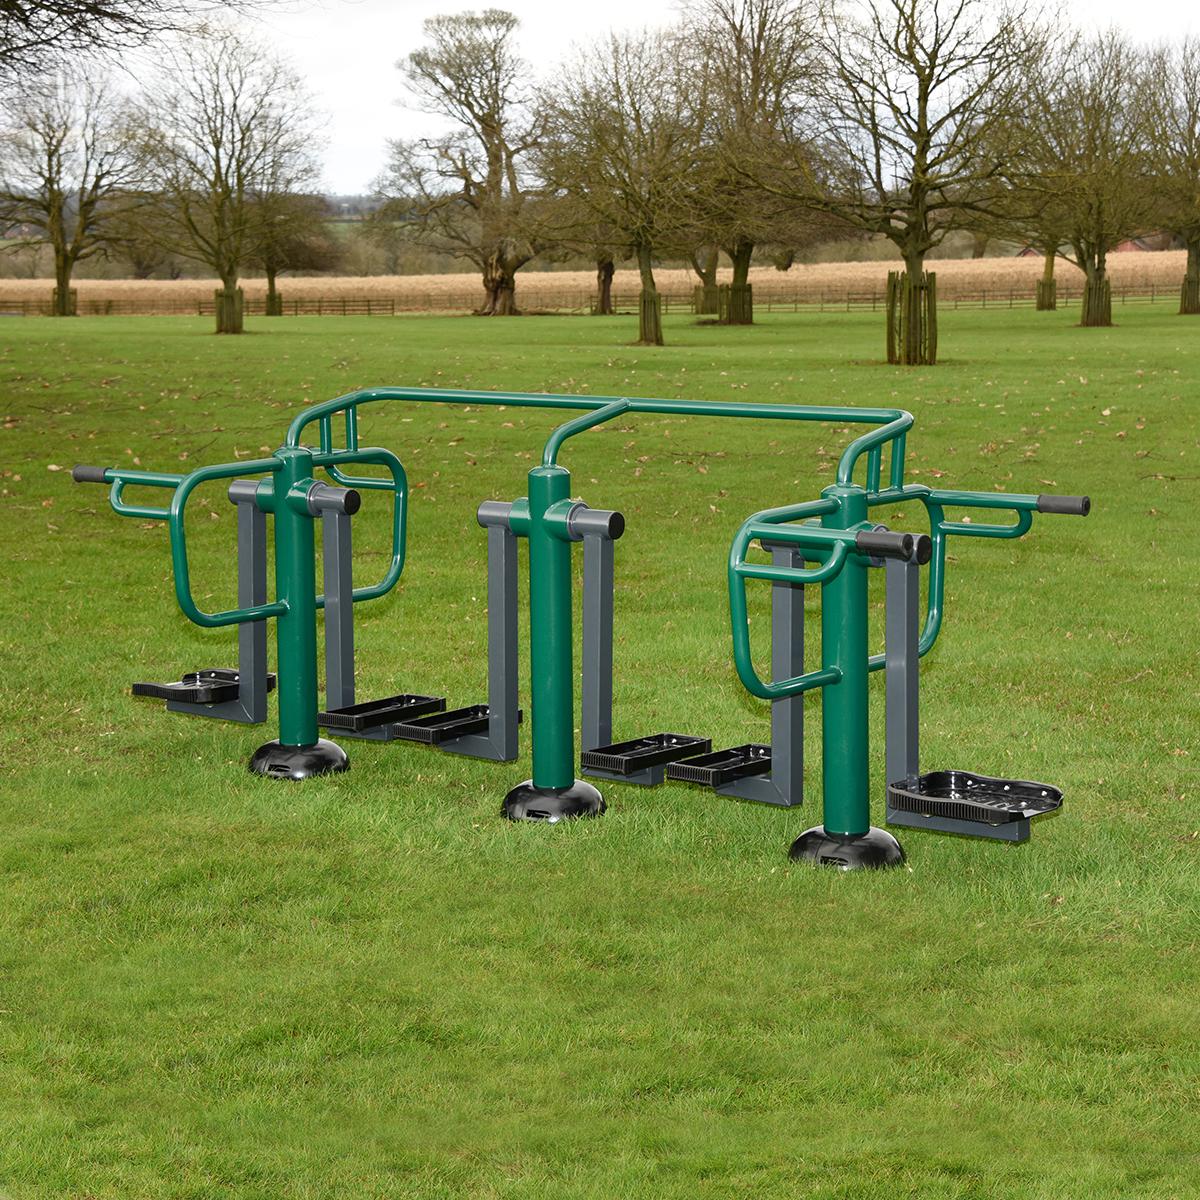 Children's Energise Multi Gym | Children's outdoor fitness station from Sunshine Gym